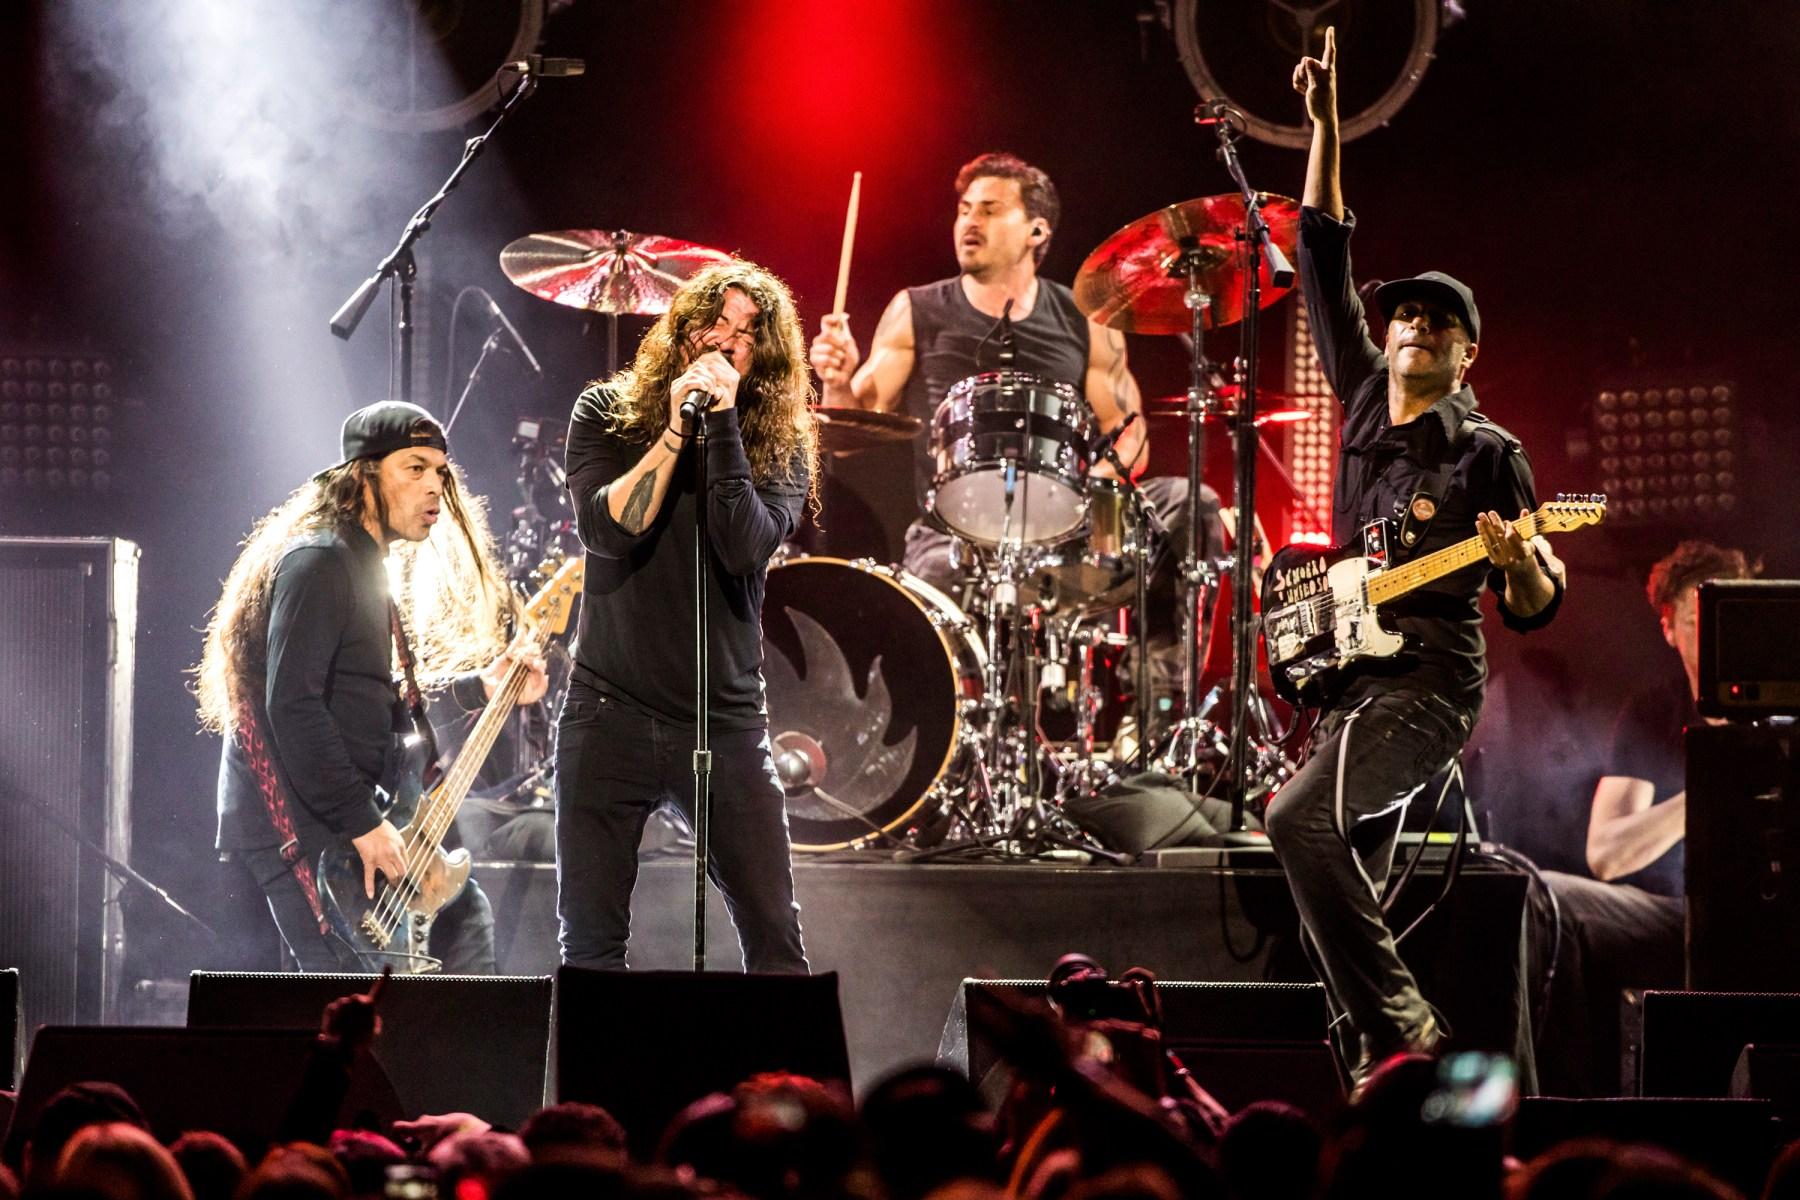 Metallica Foo Fighters Soundgarden Lead Chris Cornell Tribute Show Rolling Stone